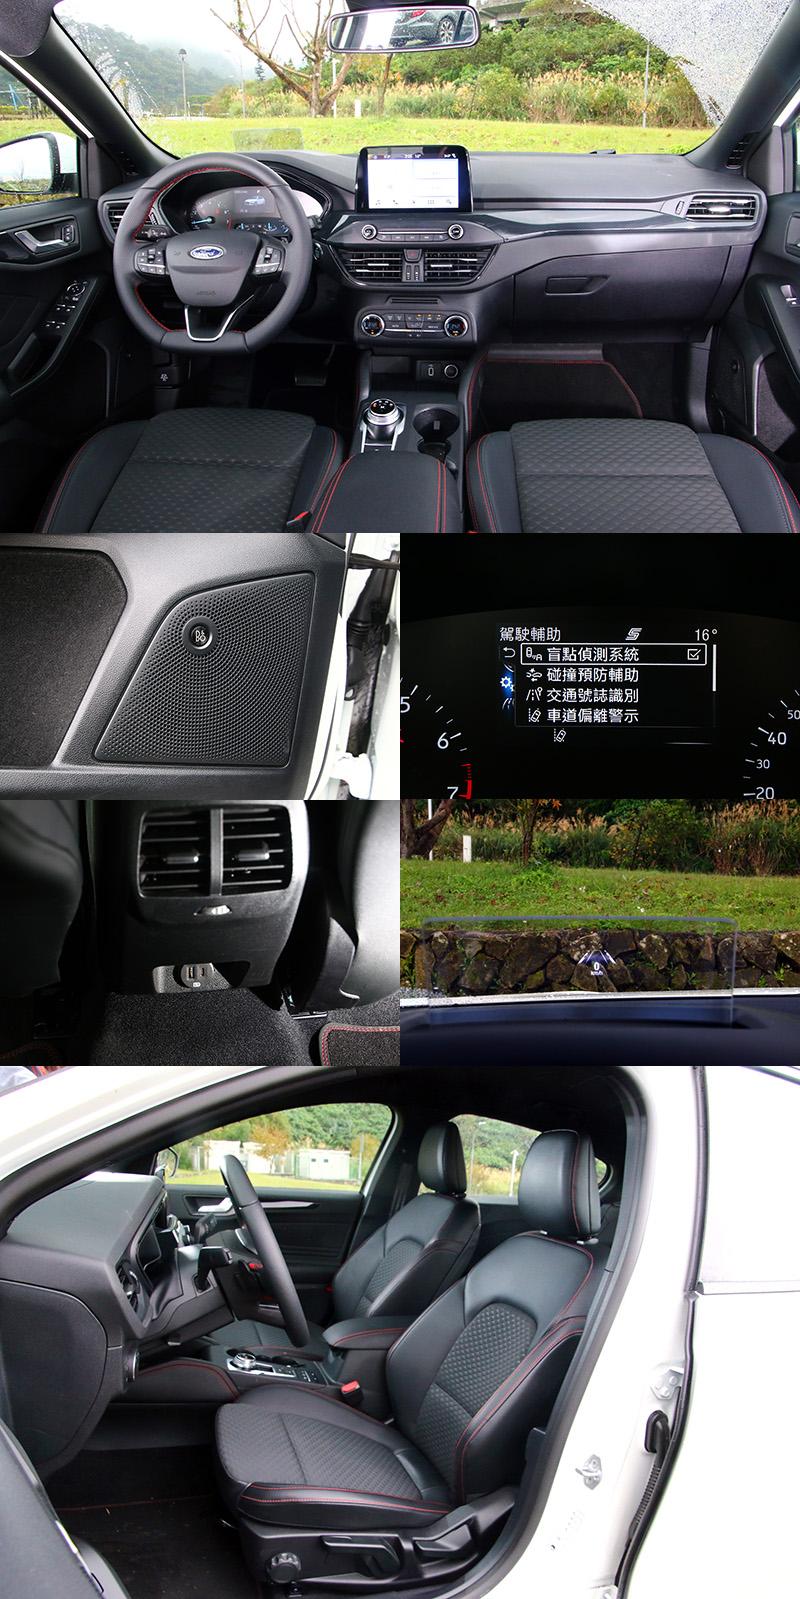 Focus ST-Line Lommel除了配置眾人所期盼的多連桿後懸吊,在其他配備上與Focus ST-Line完全相同,包括:達Level 2半自動駕駛標準的Ford Co-Pilot360全方位智駕科技輔助系統、B&O音響、抬頭顯示器、後座獨立USB插座等配備一應具全,可說是給足了誠意,真要挑毛病,唯獨車內飾板塑味較重。